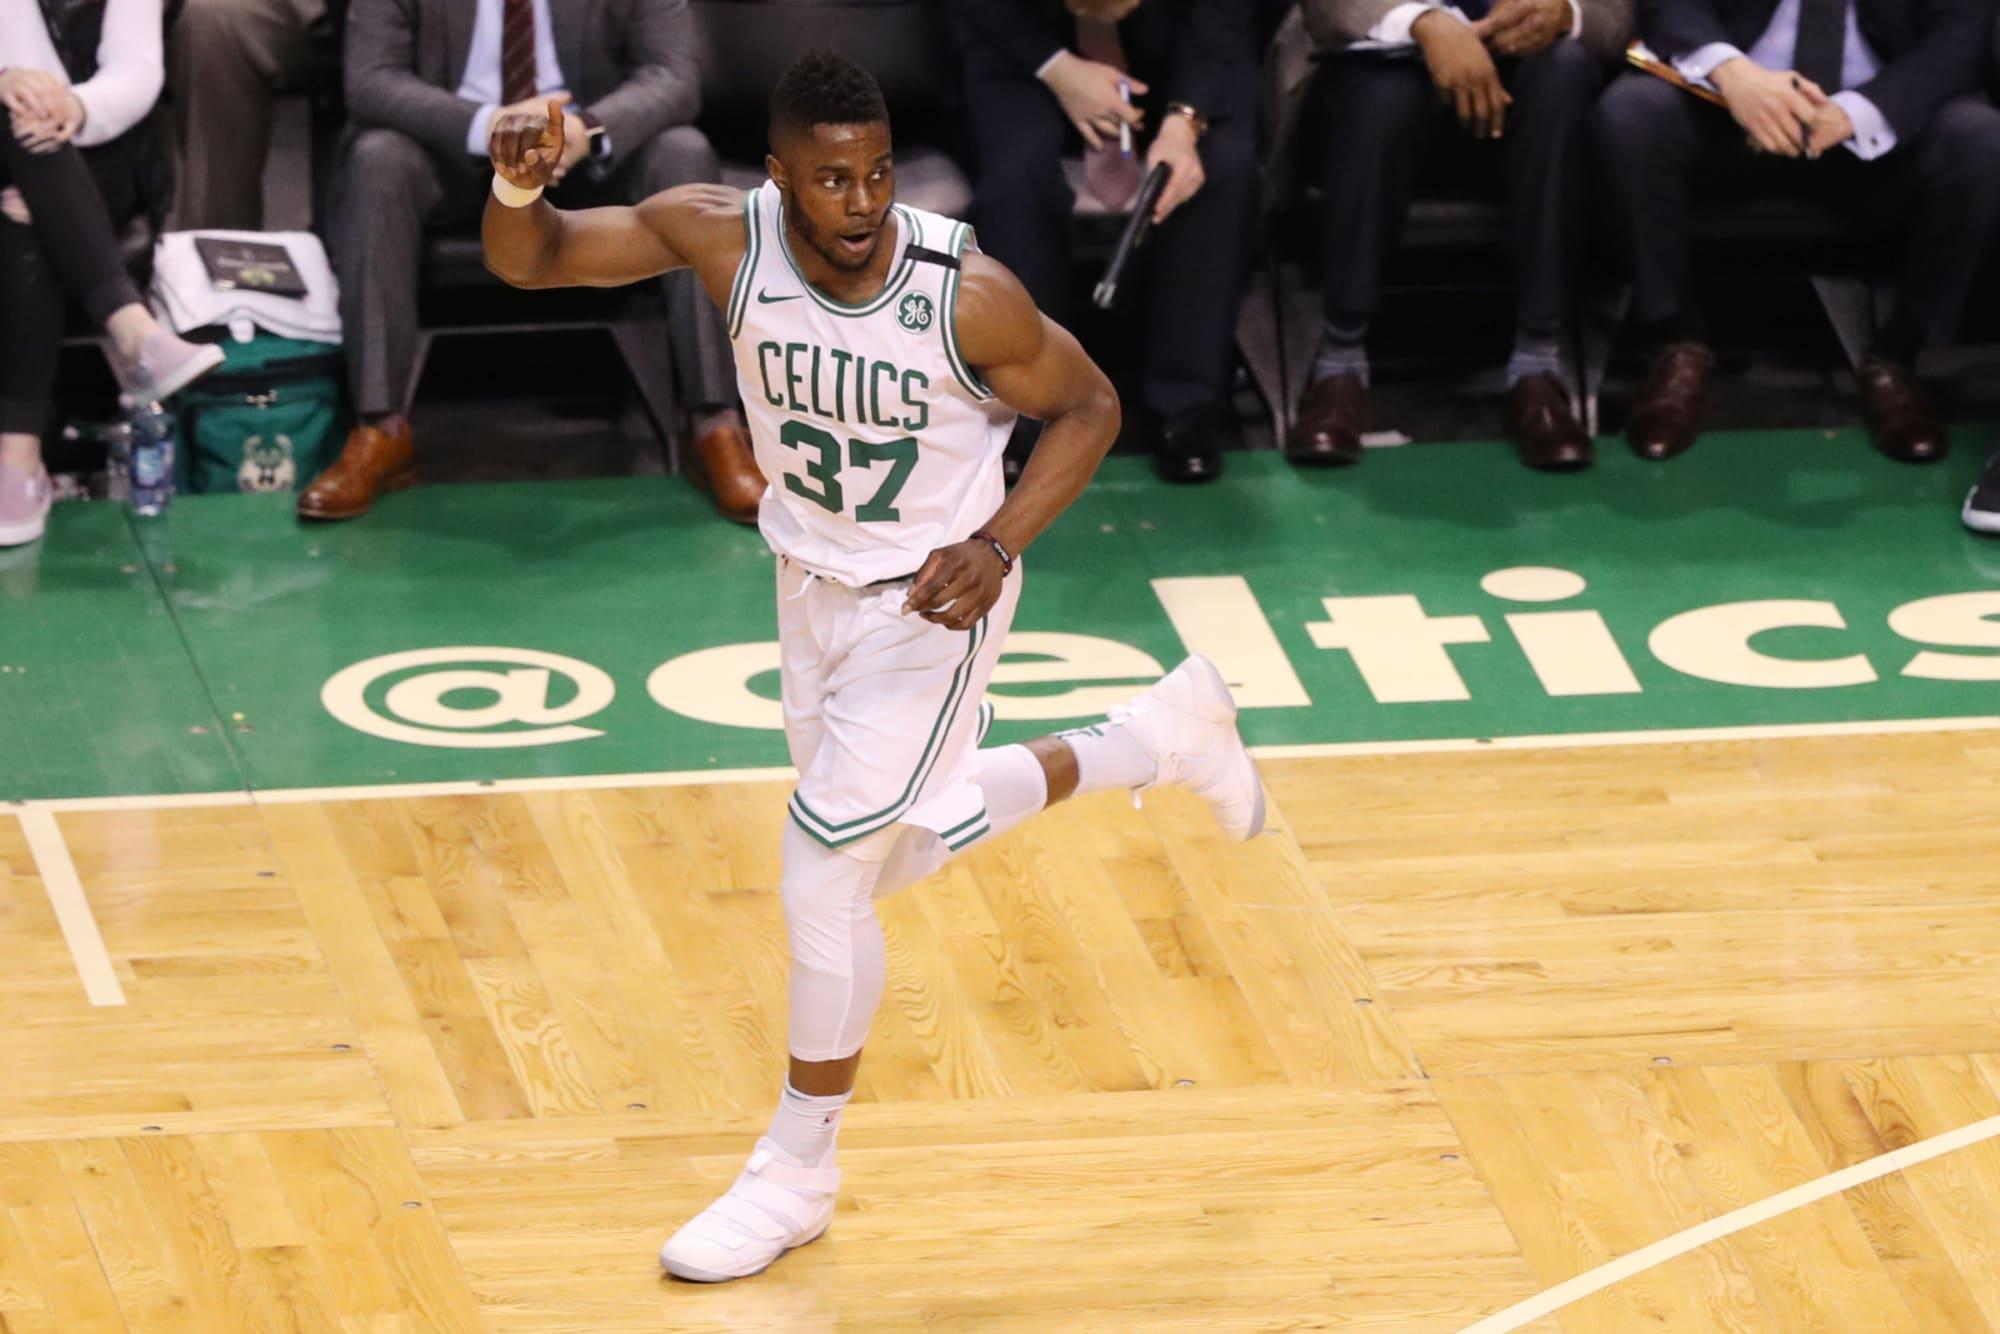 Boston Celtics Semi Ojeleye will be a big factor this season